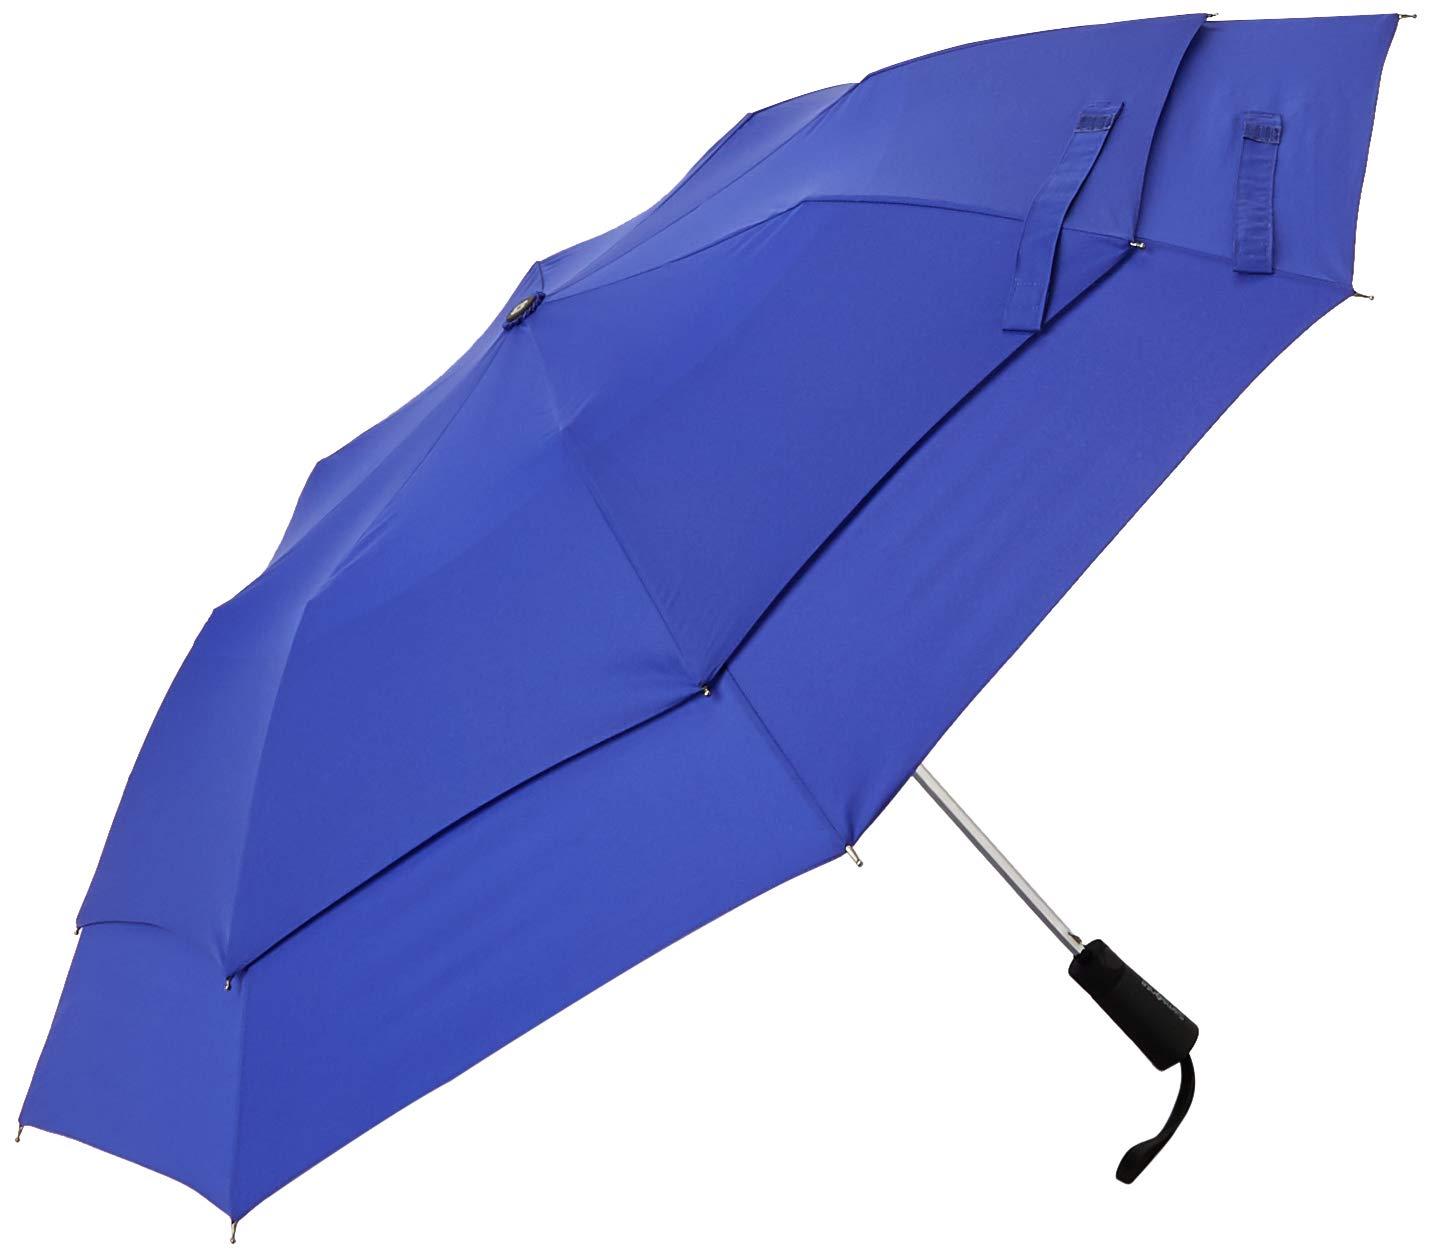 Samsonite Windguard Auto Open Umbrella, Aqua Blue, One Size